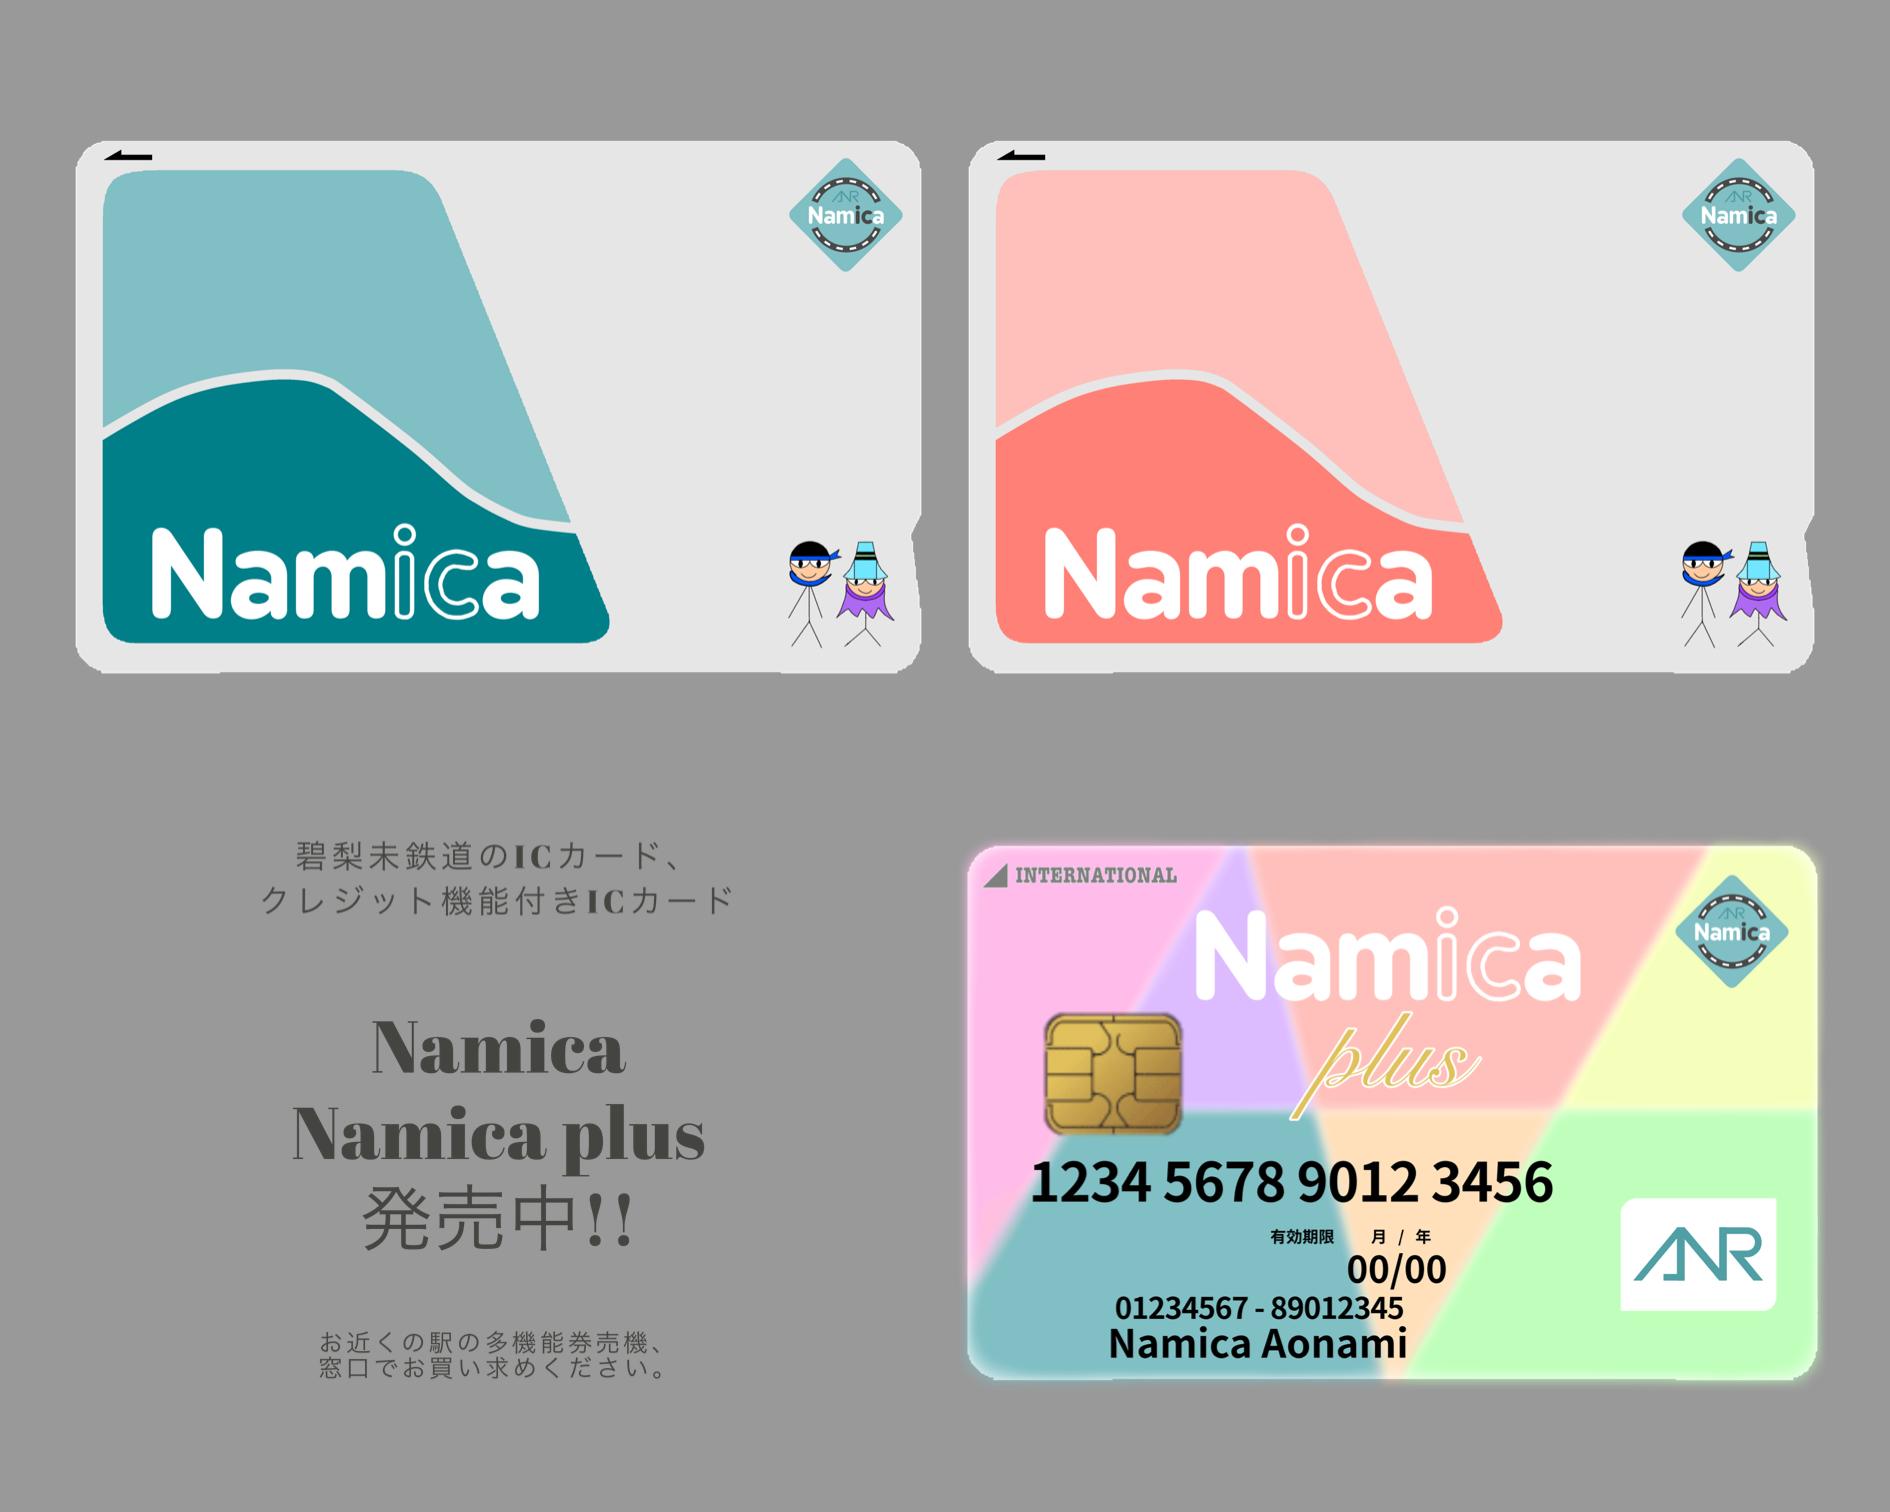 Namica-04.png